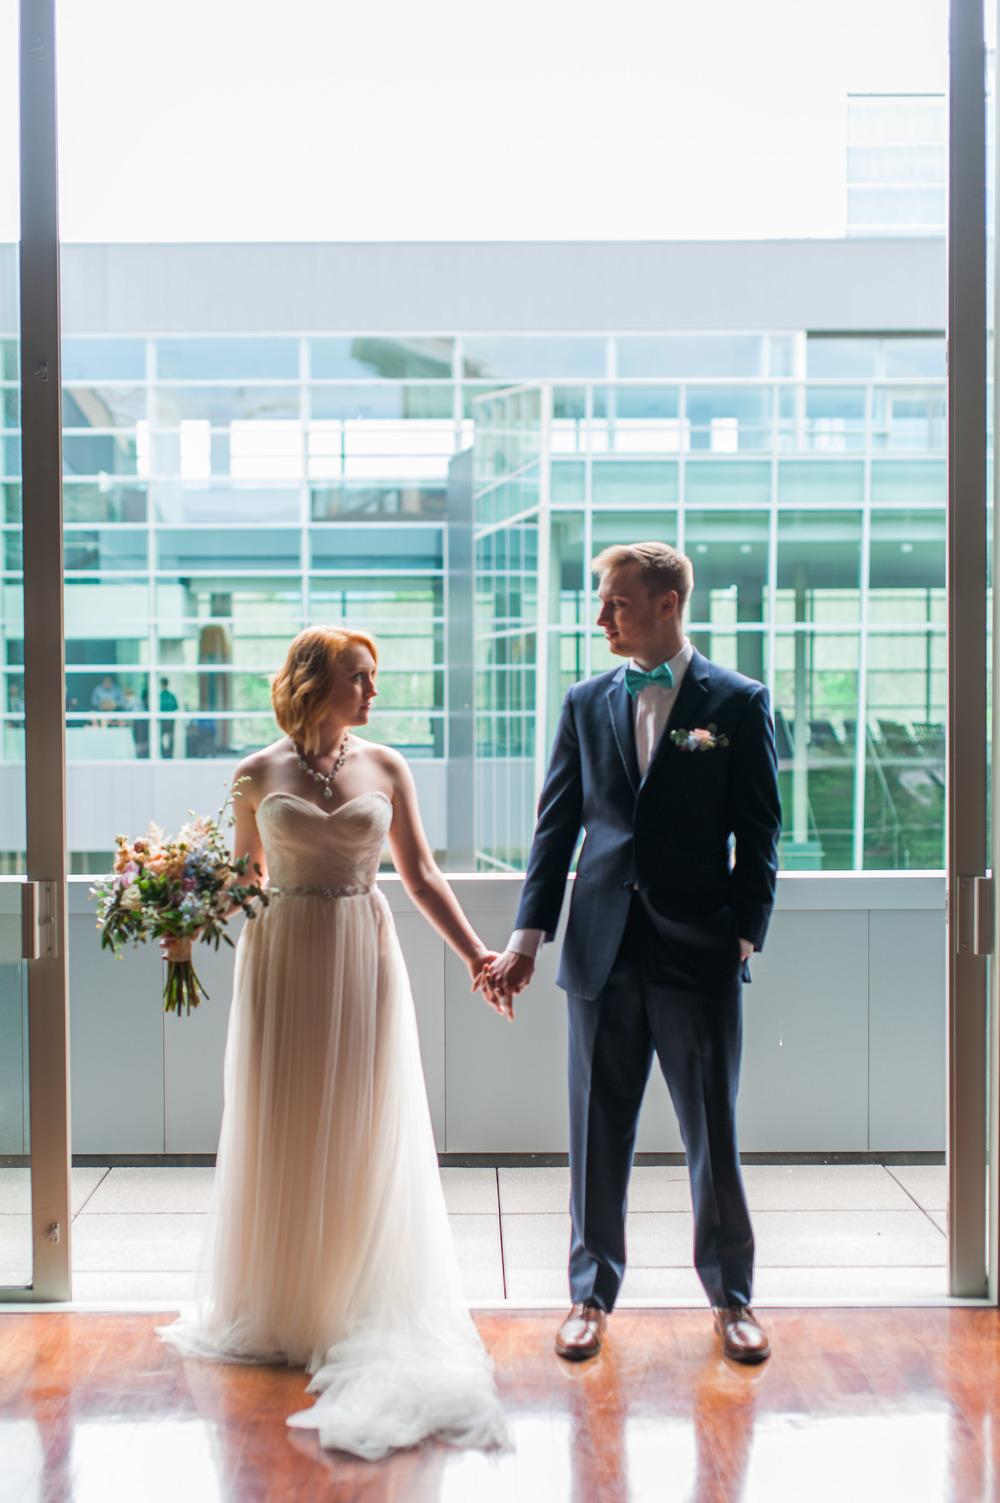 omaha-holland-arts-center-wedding-38.jpg